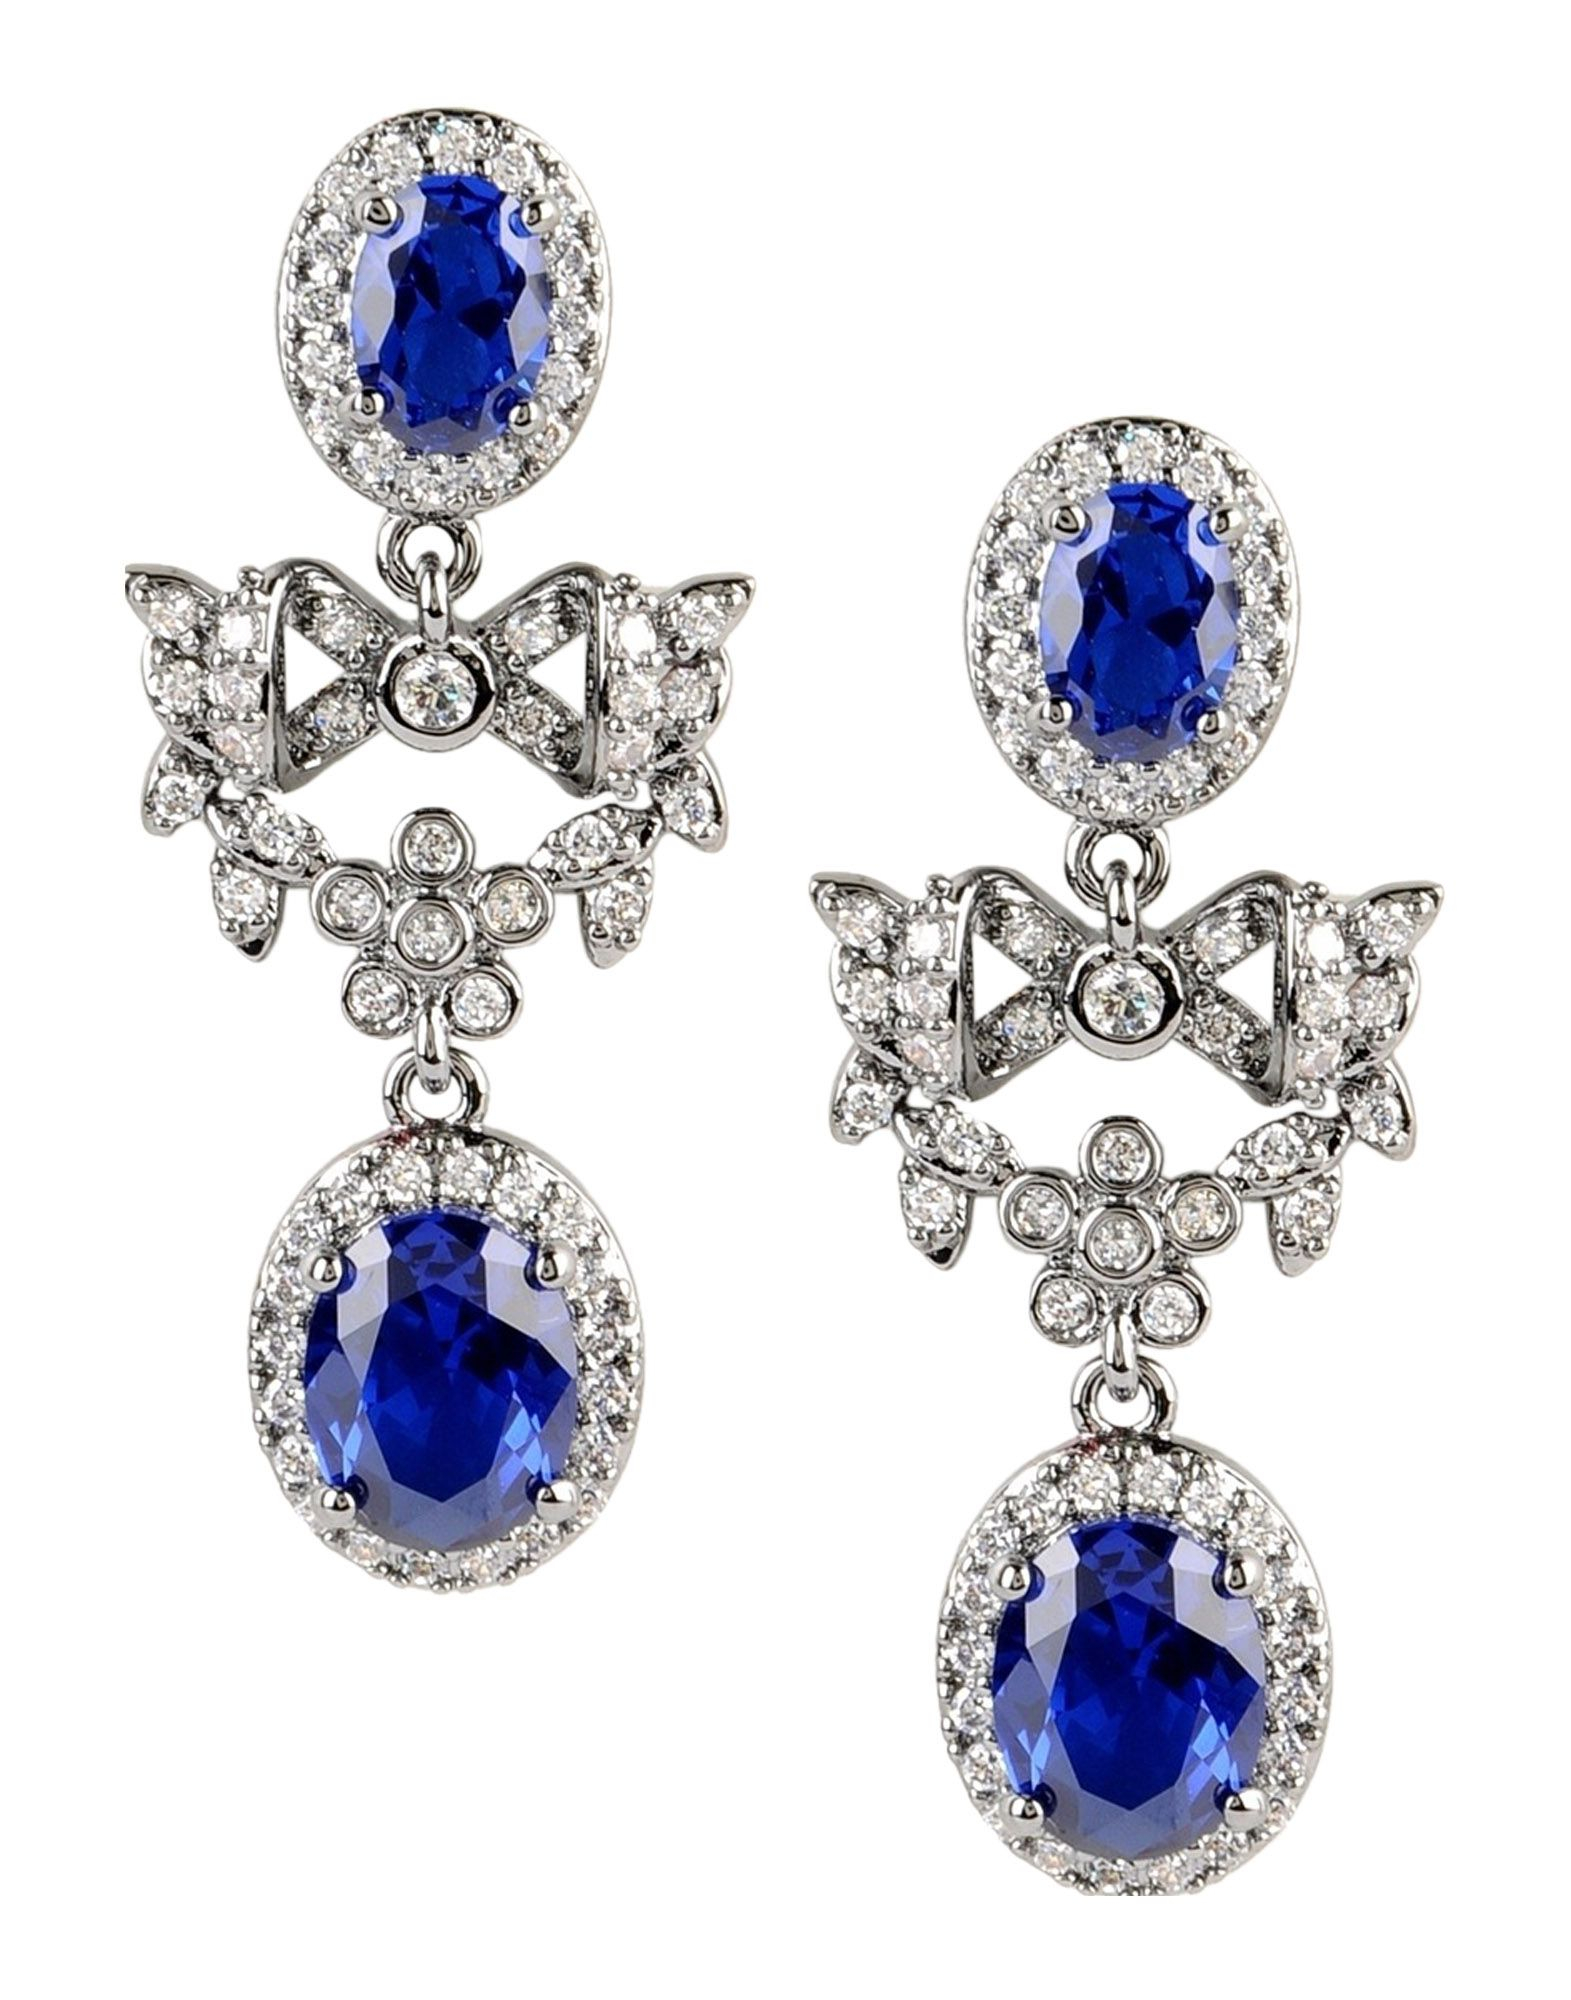 lyst cz by kenneth jay lane earrings in blue. Black Bedroom Furniture Sets. Home Design Ideas